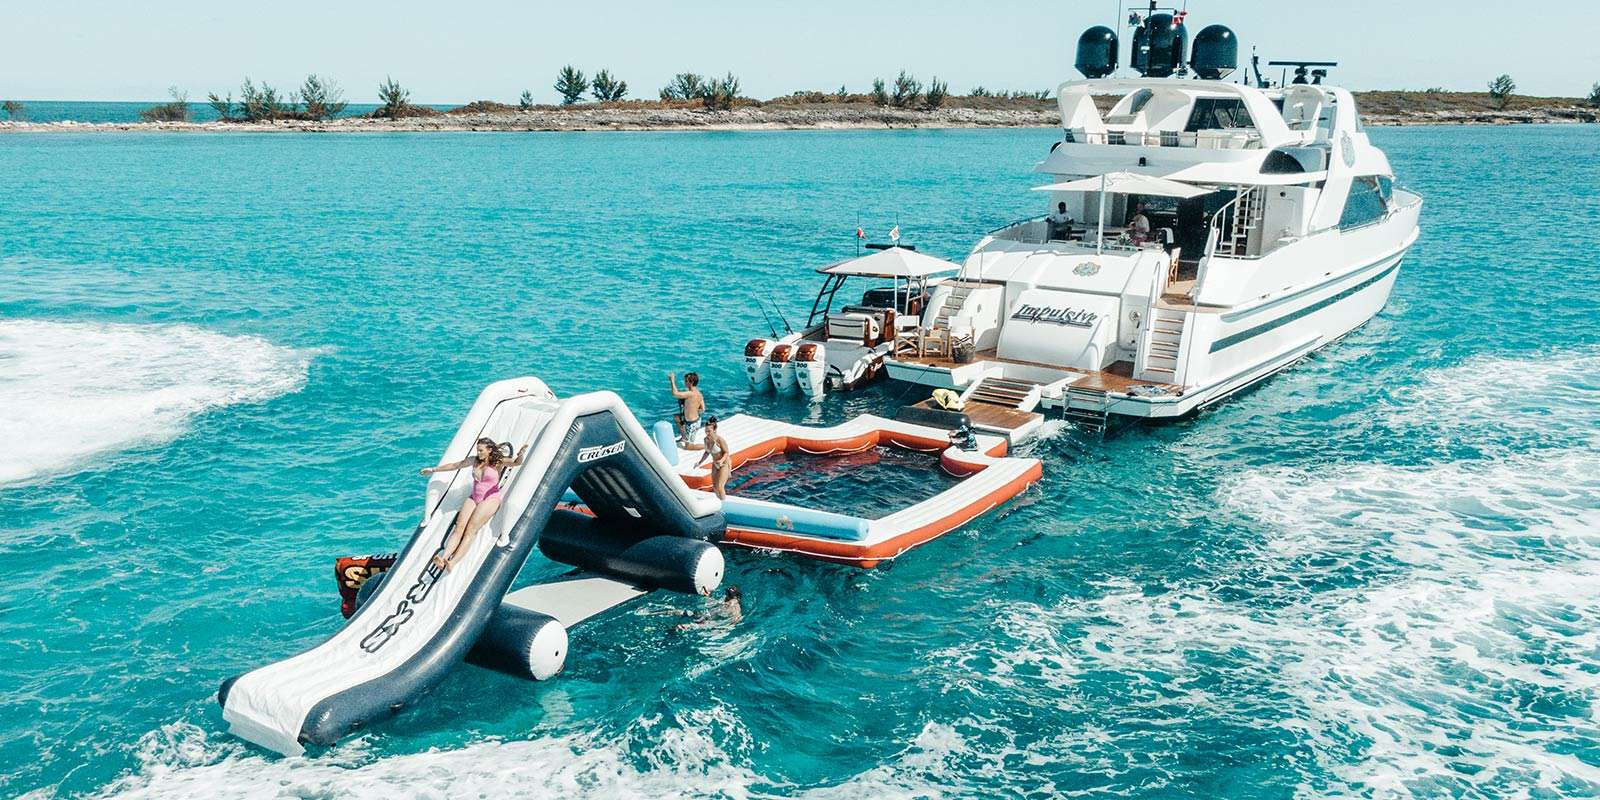 Impulsive yacht image # 11